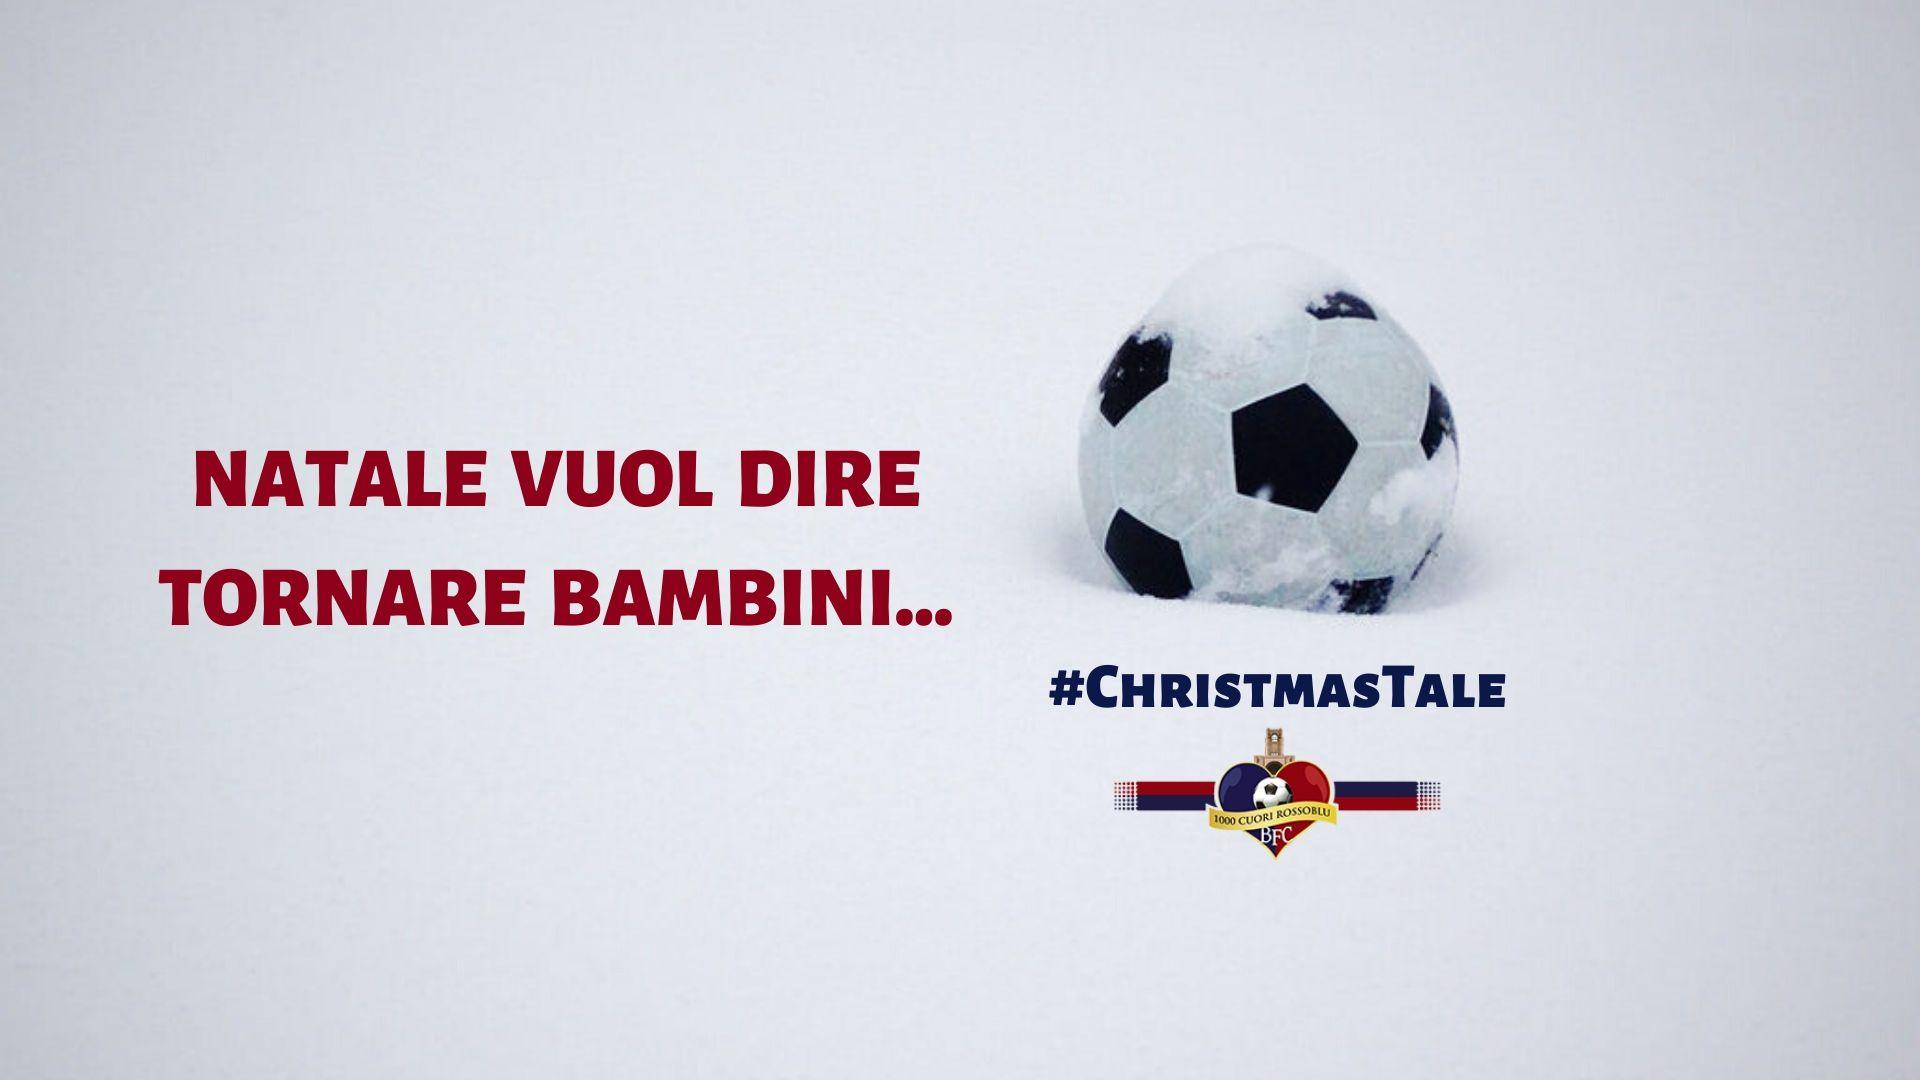 #Christmas Tale - Natale vuol dire tornare bambini